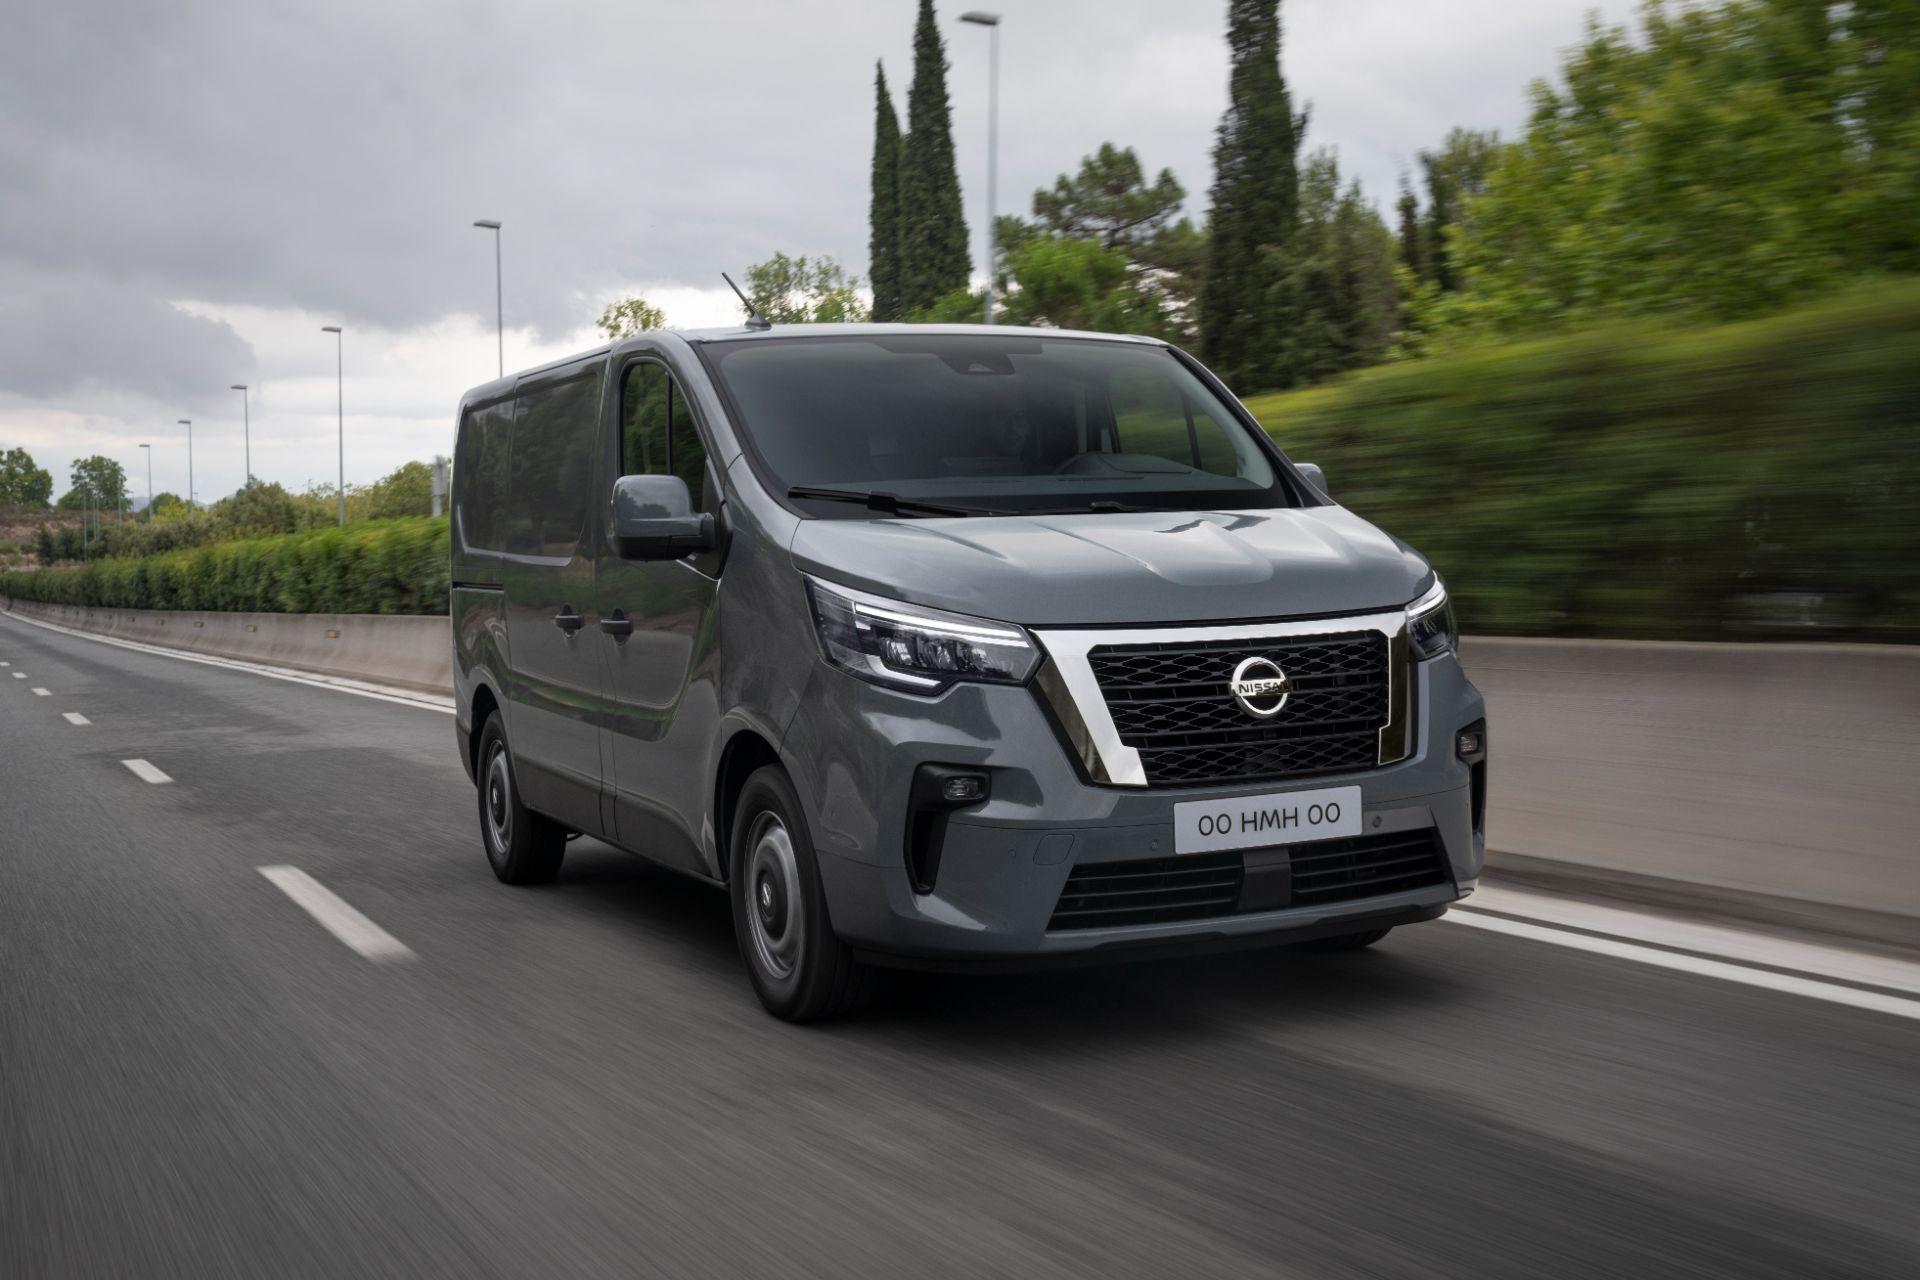 2022-Nissan-Primastar-van-3-1